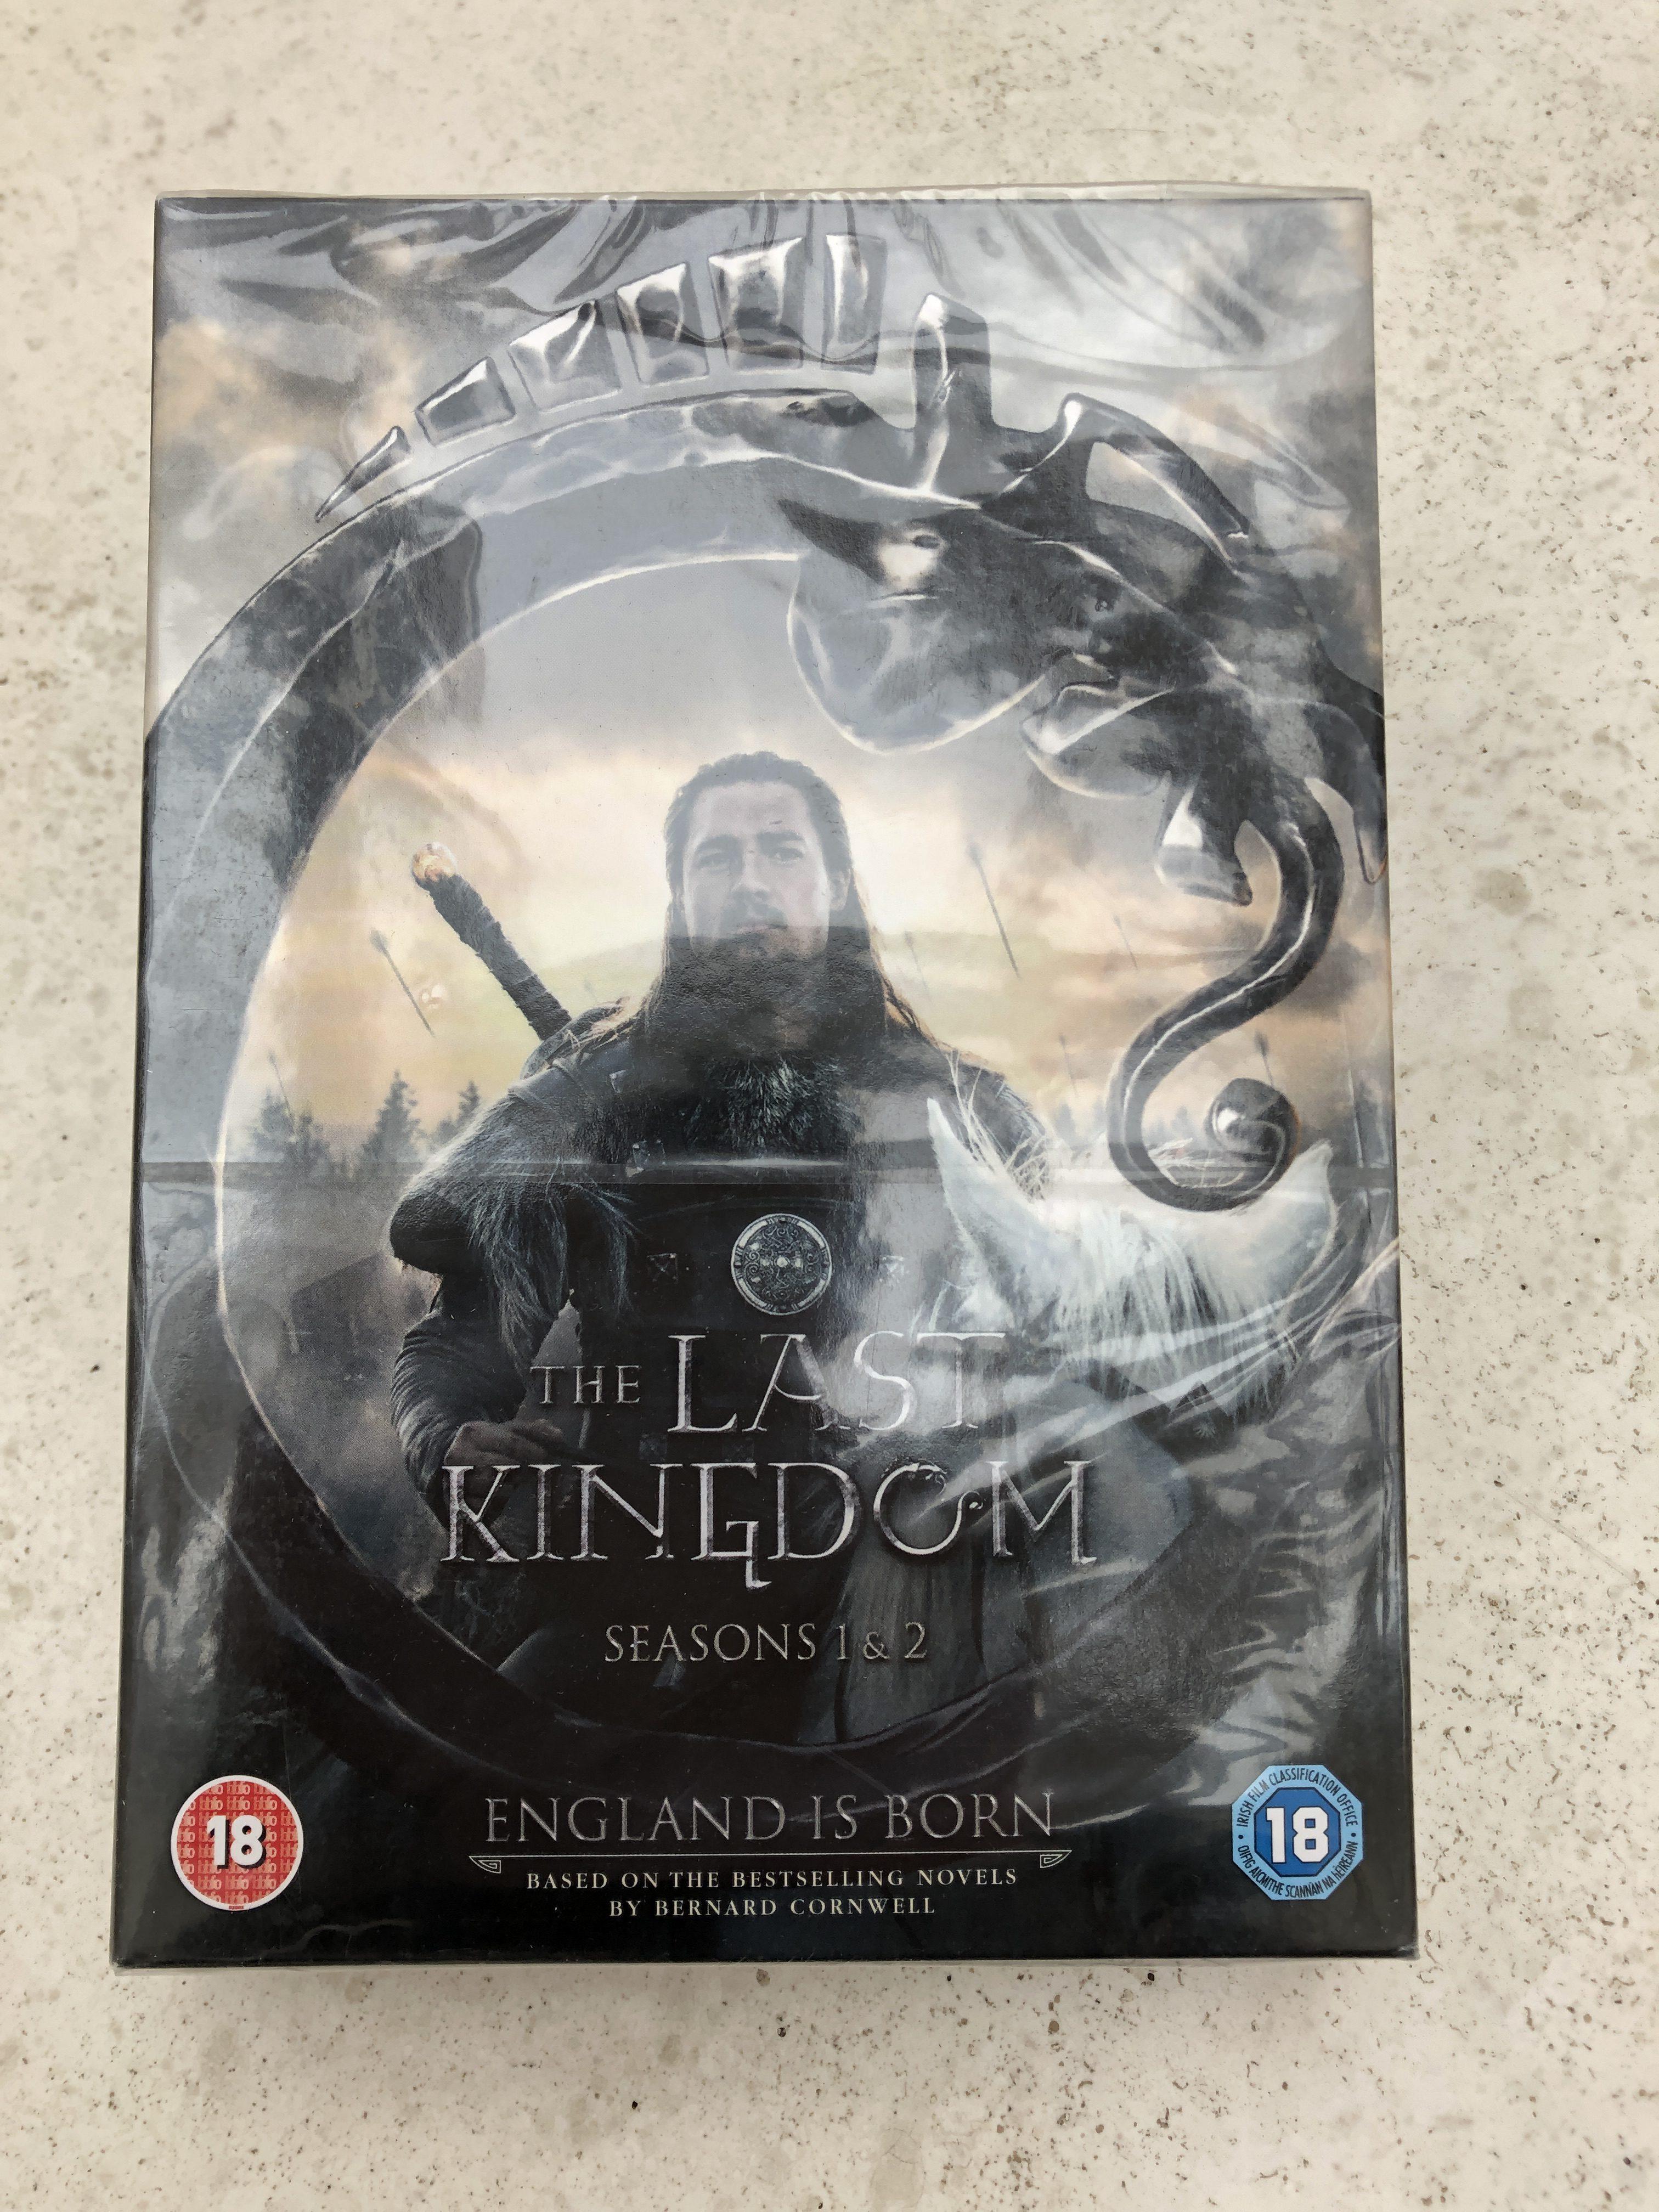 Last Kingdom DVD front